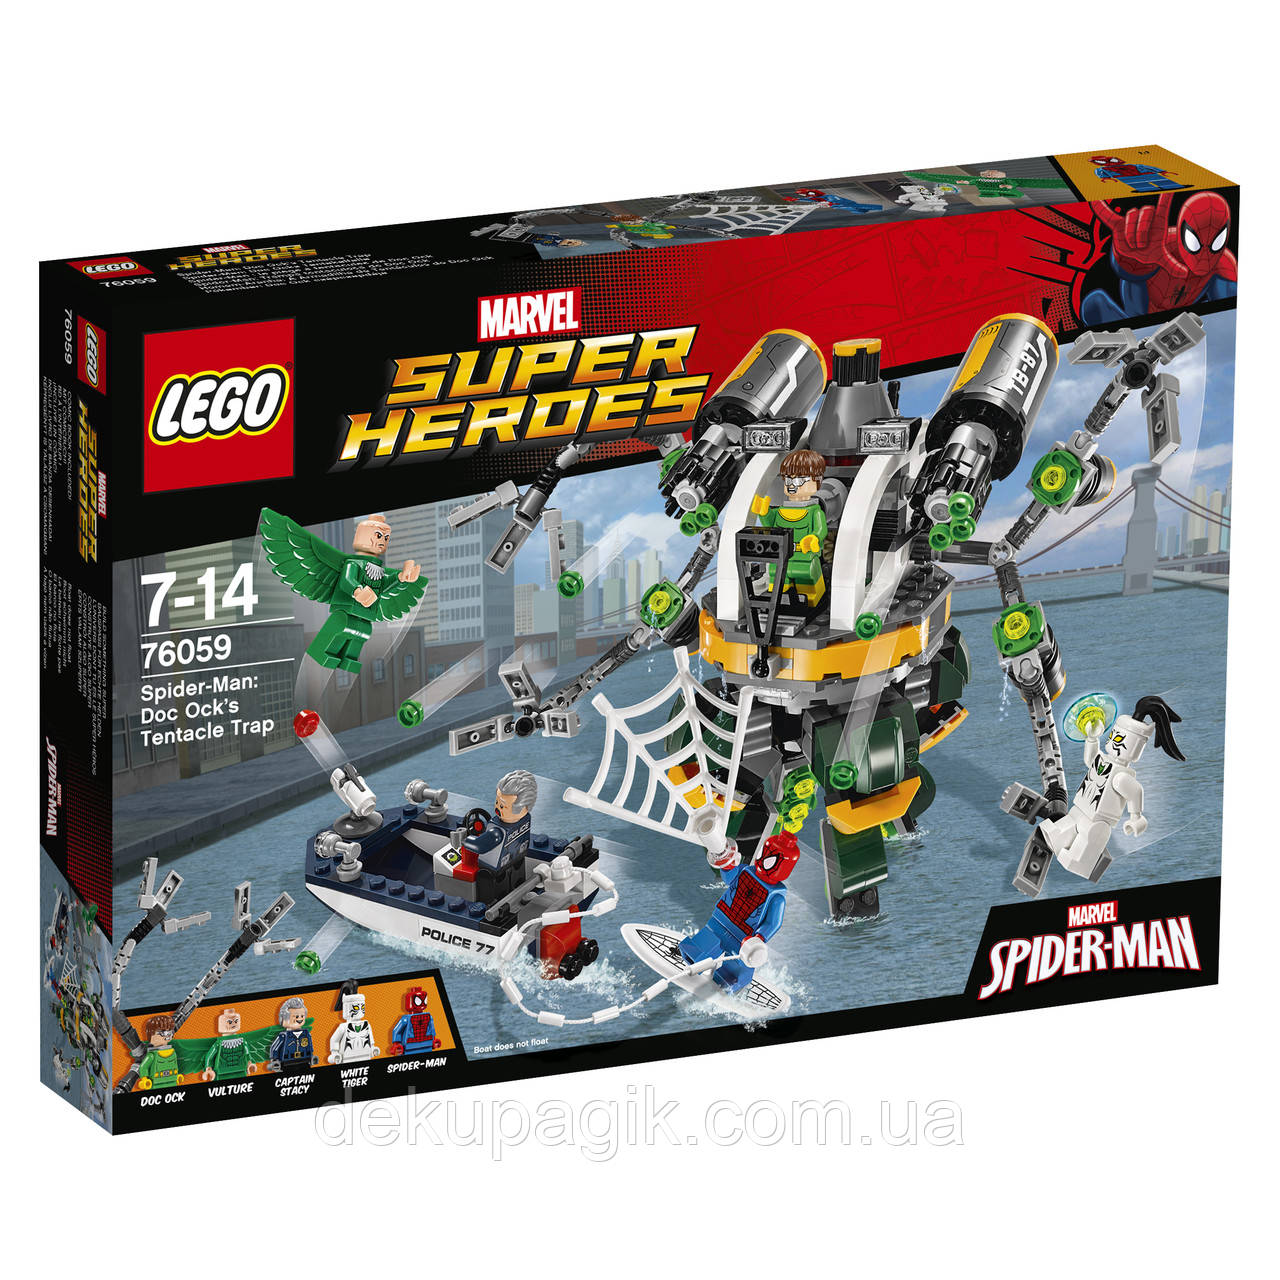 LEGO Super Heroes Человек-паук: в ловушке Доктора Осьминога 76059